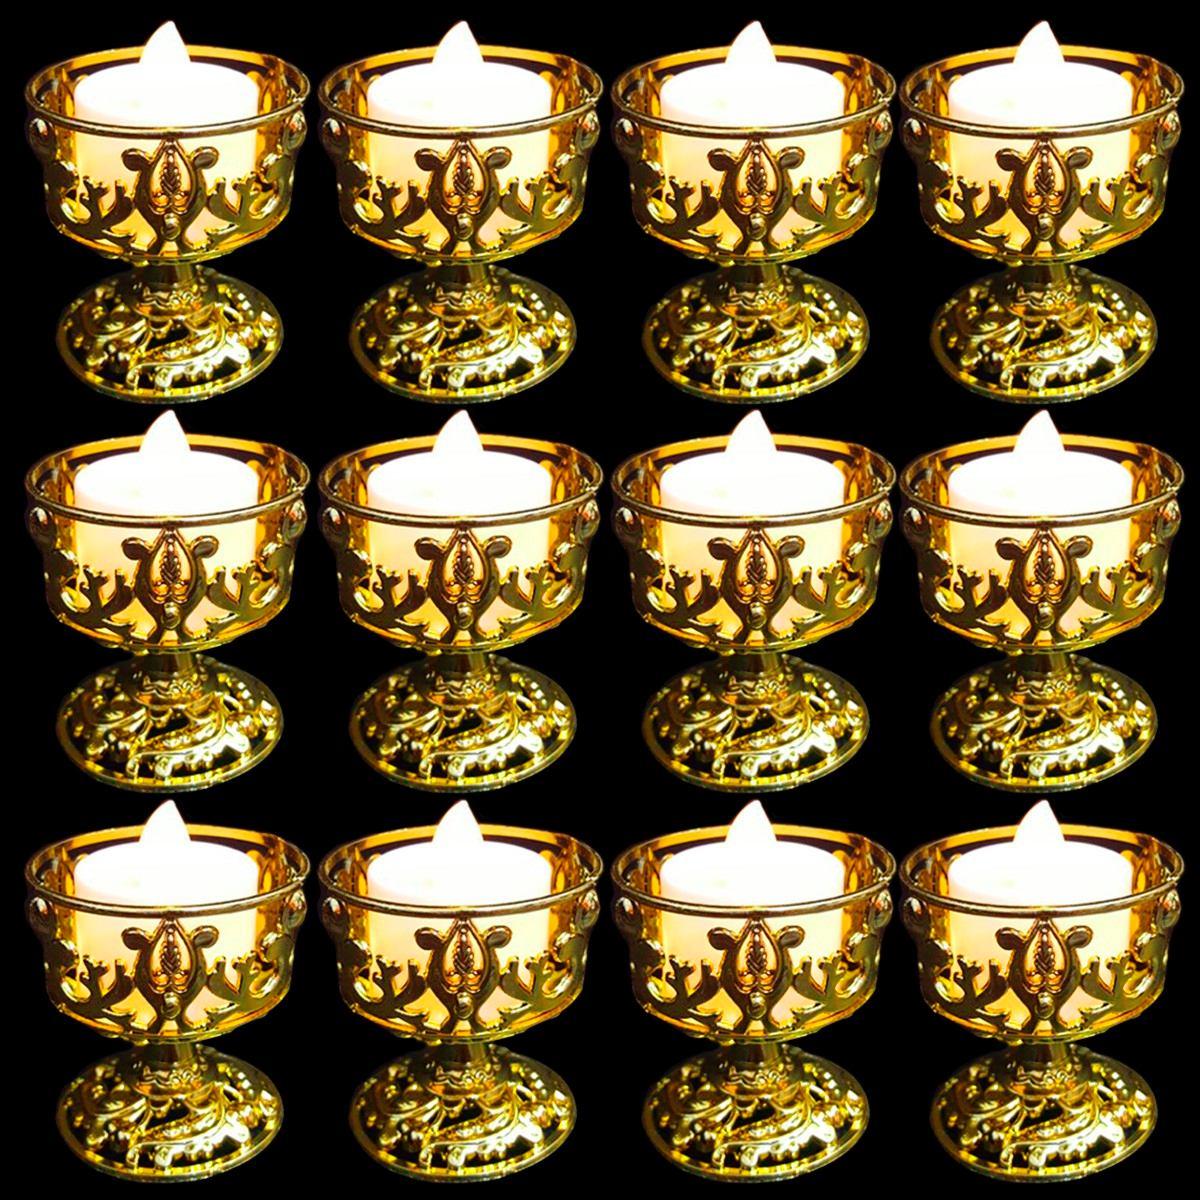 12 casti al dourado proven al decora o vela led r 60 - Soporte para velas ...